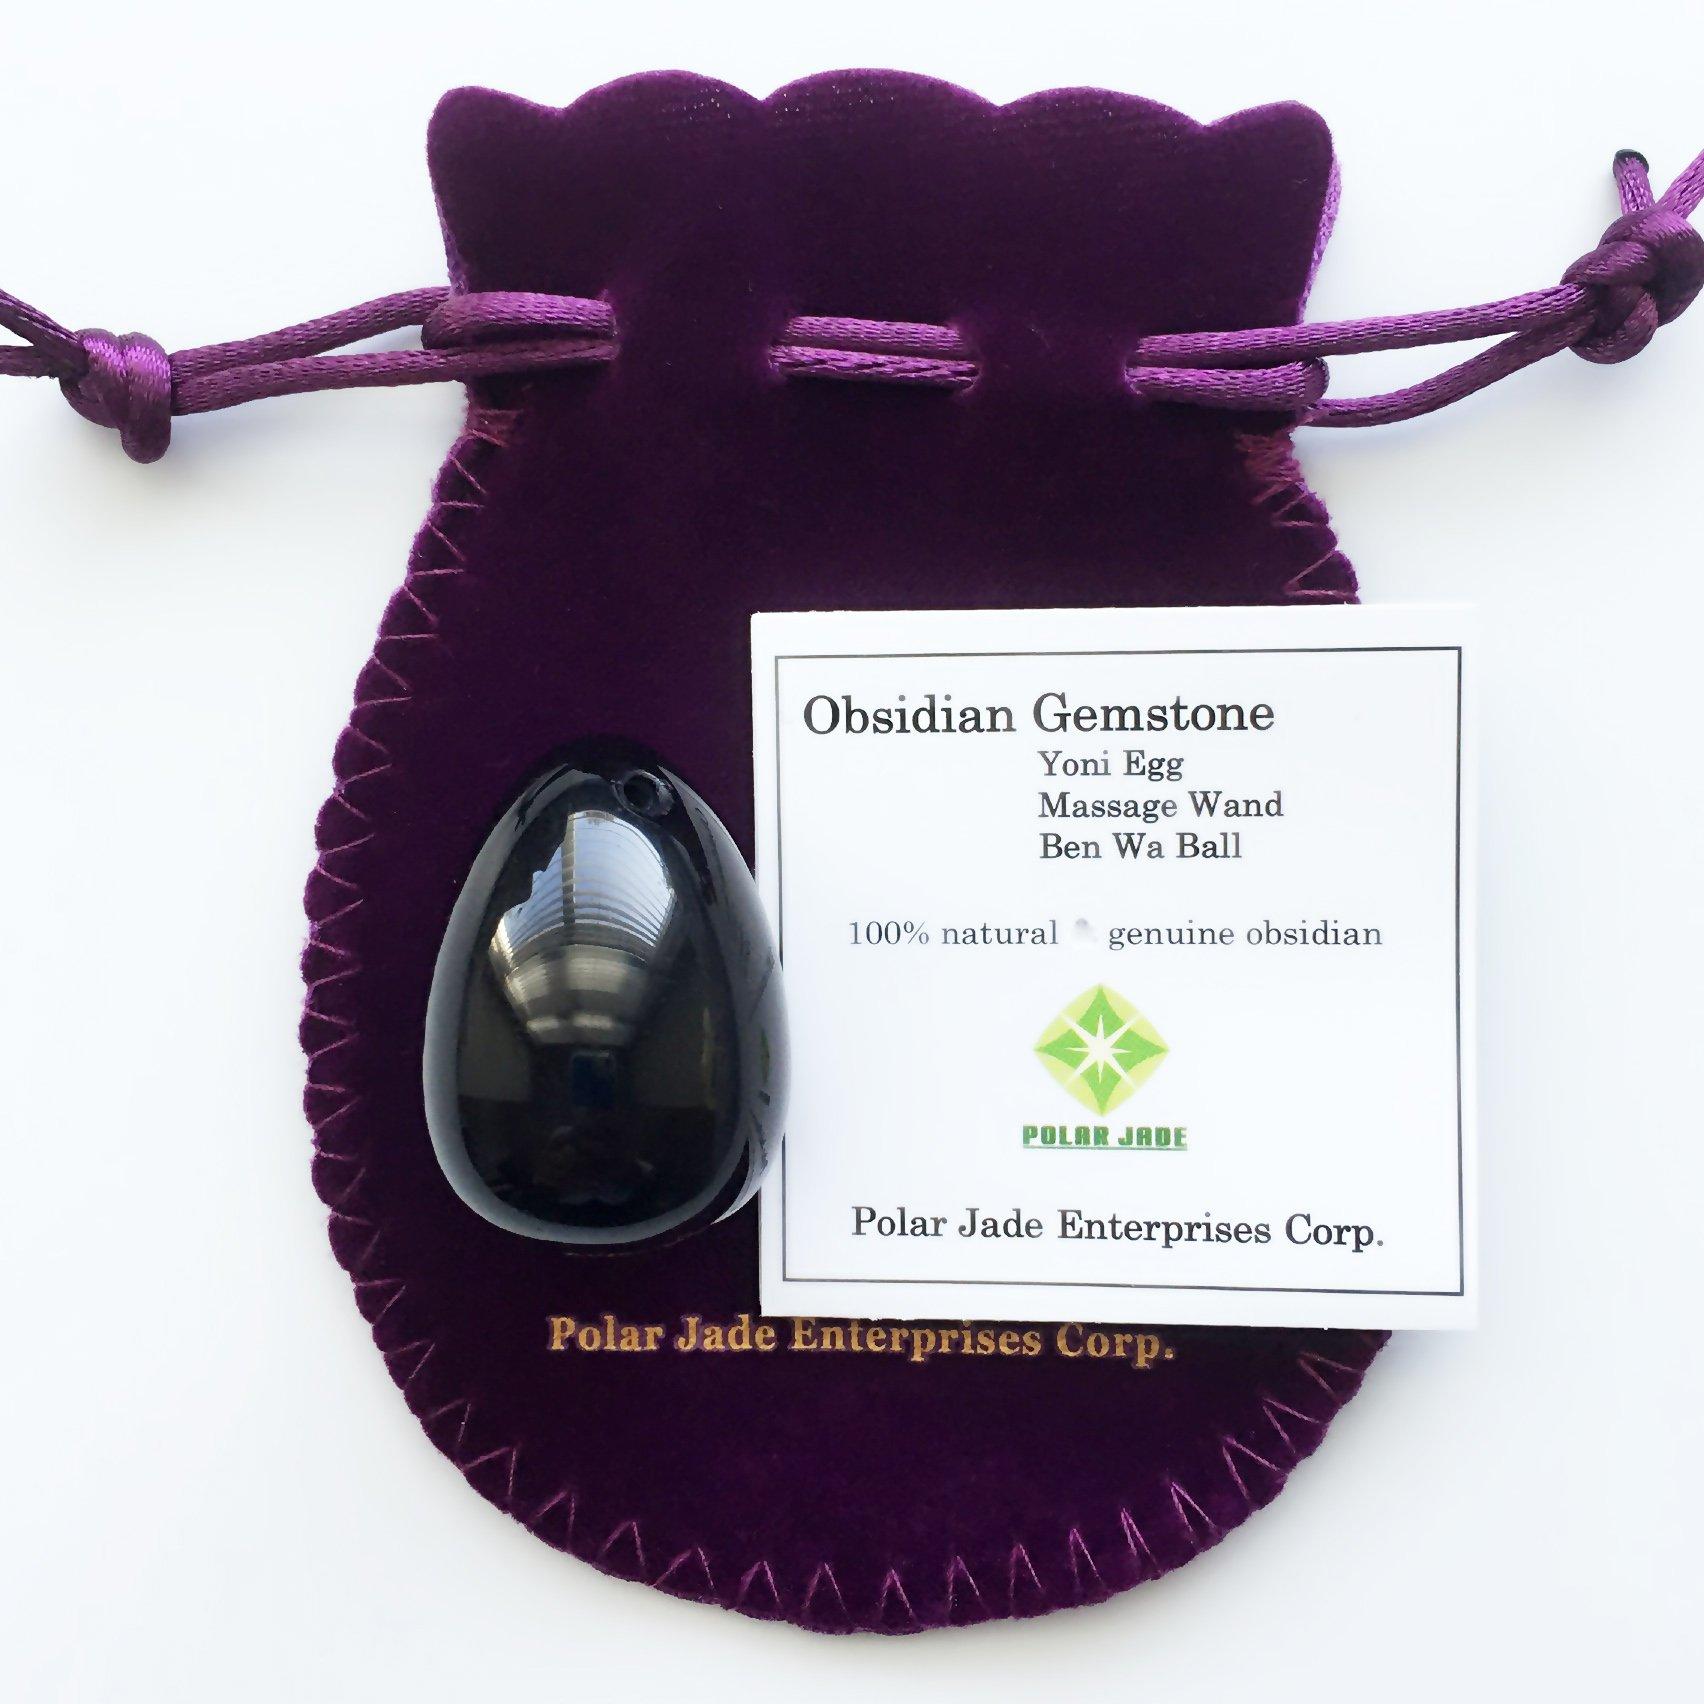 Yoni Egg of Obsidian Gemstone (Kegel Jade Egg), Drilled, Manually Polished, Entry Level Affordable, Small Size (35x25mm) by Polar Jade